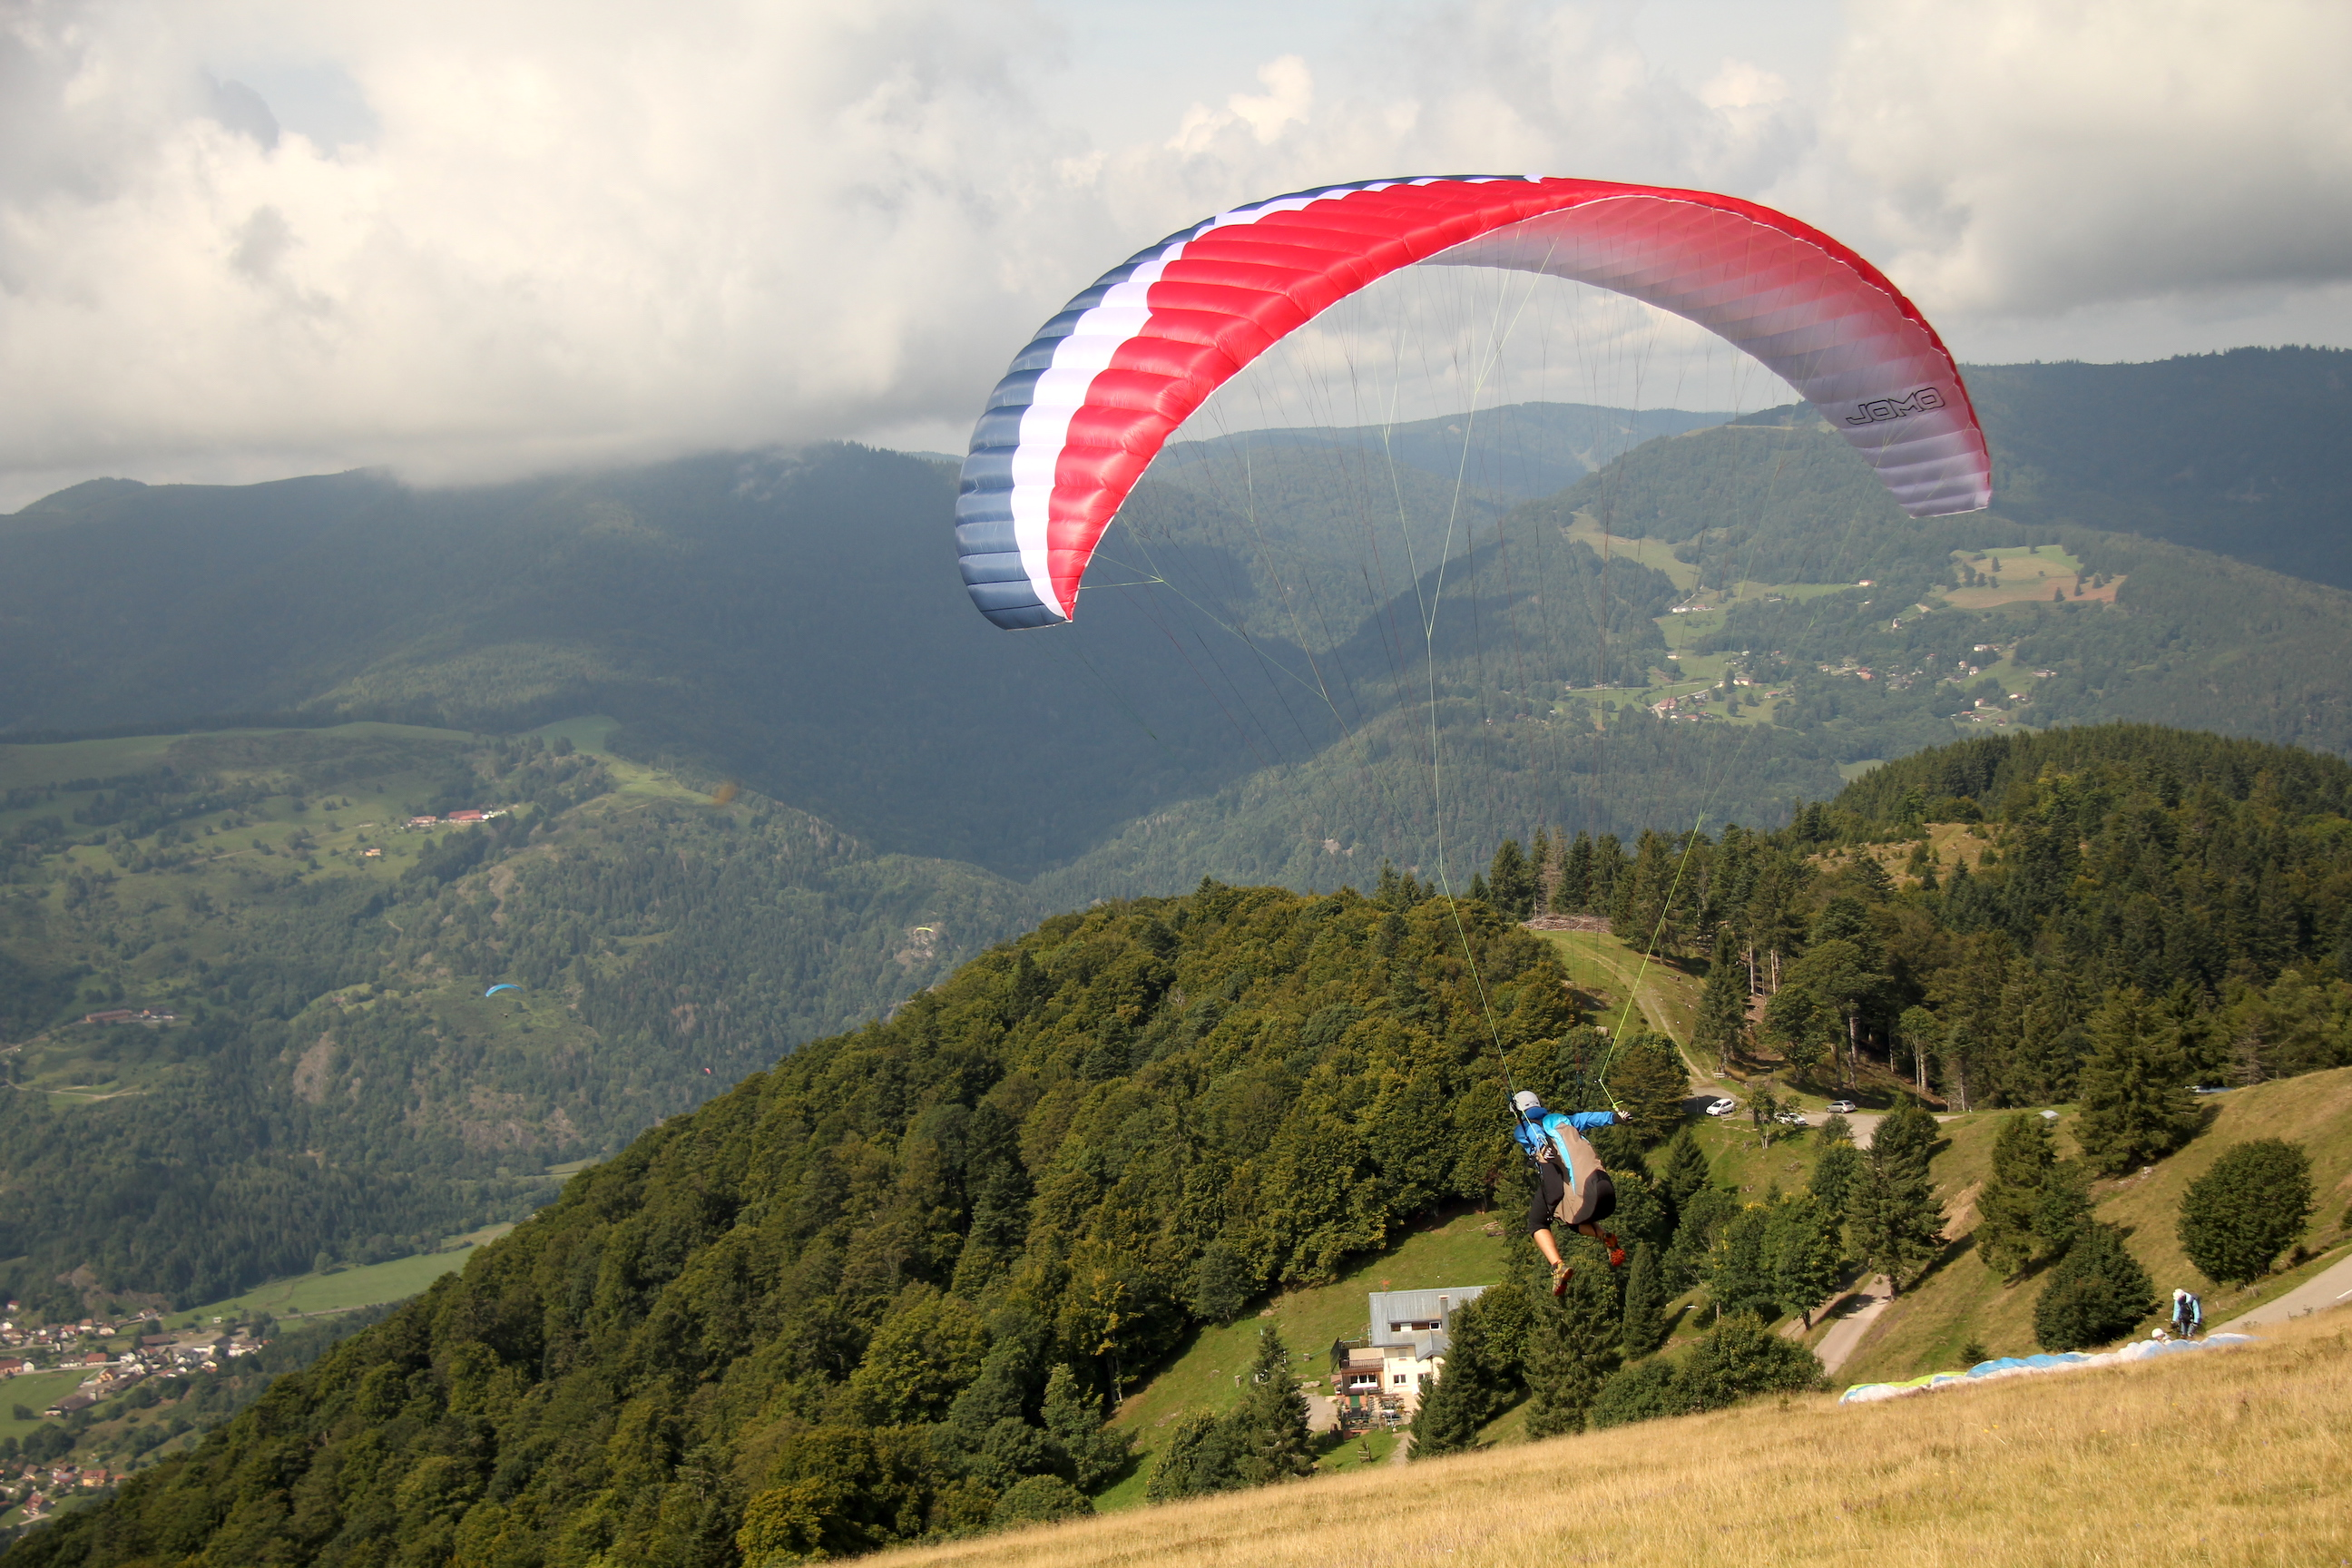 saut_parachute_mulhouse